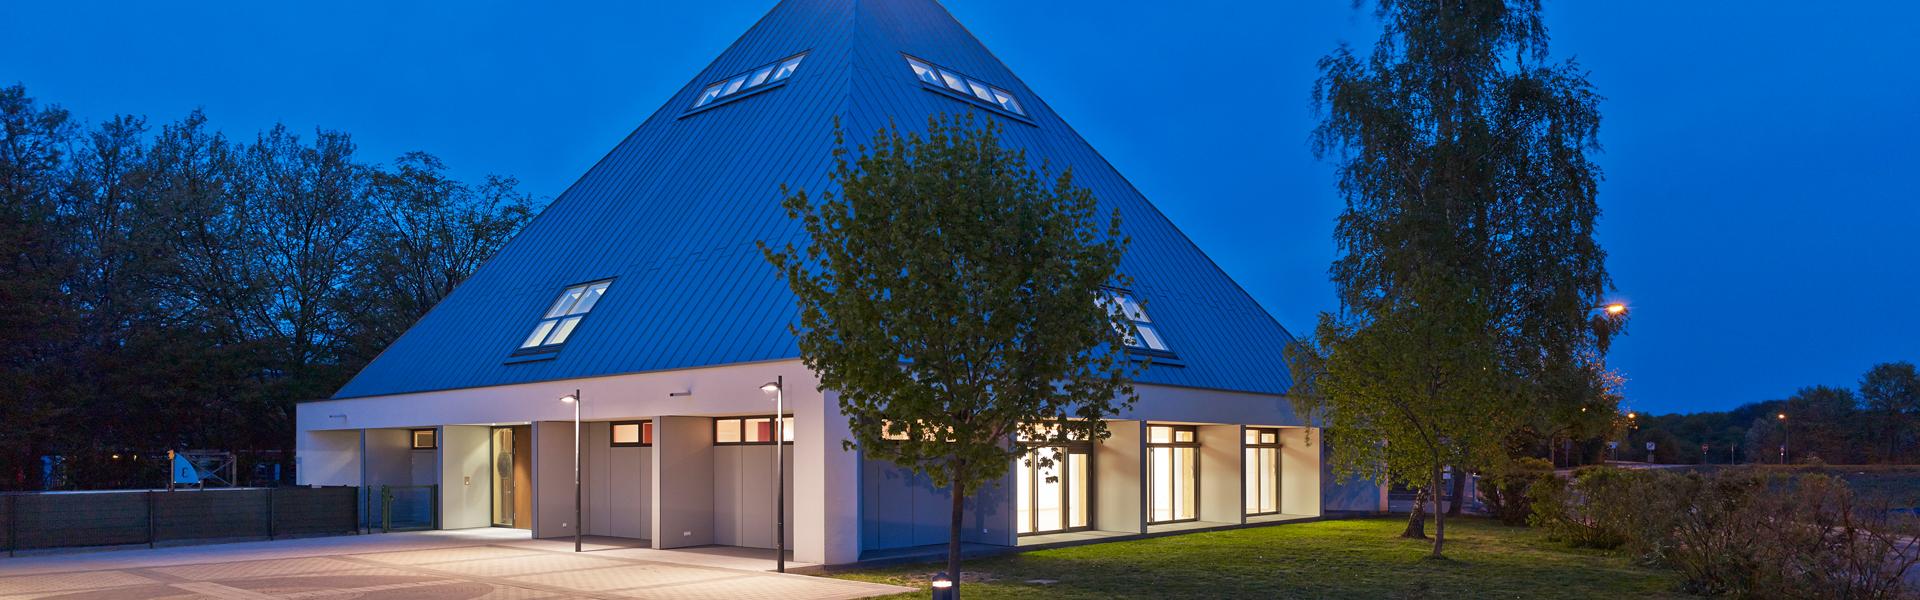 katholische kirche pfarrgemeinde heilig kreuz bergen enkheim katholische pfarrgemeinde. Black Bedroom Furniture Sets. Home Design Ideas